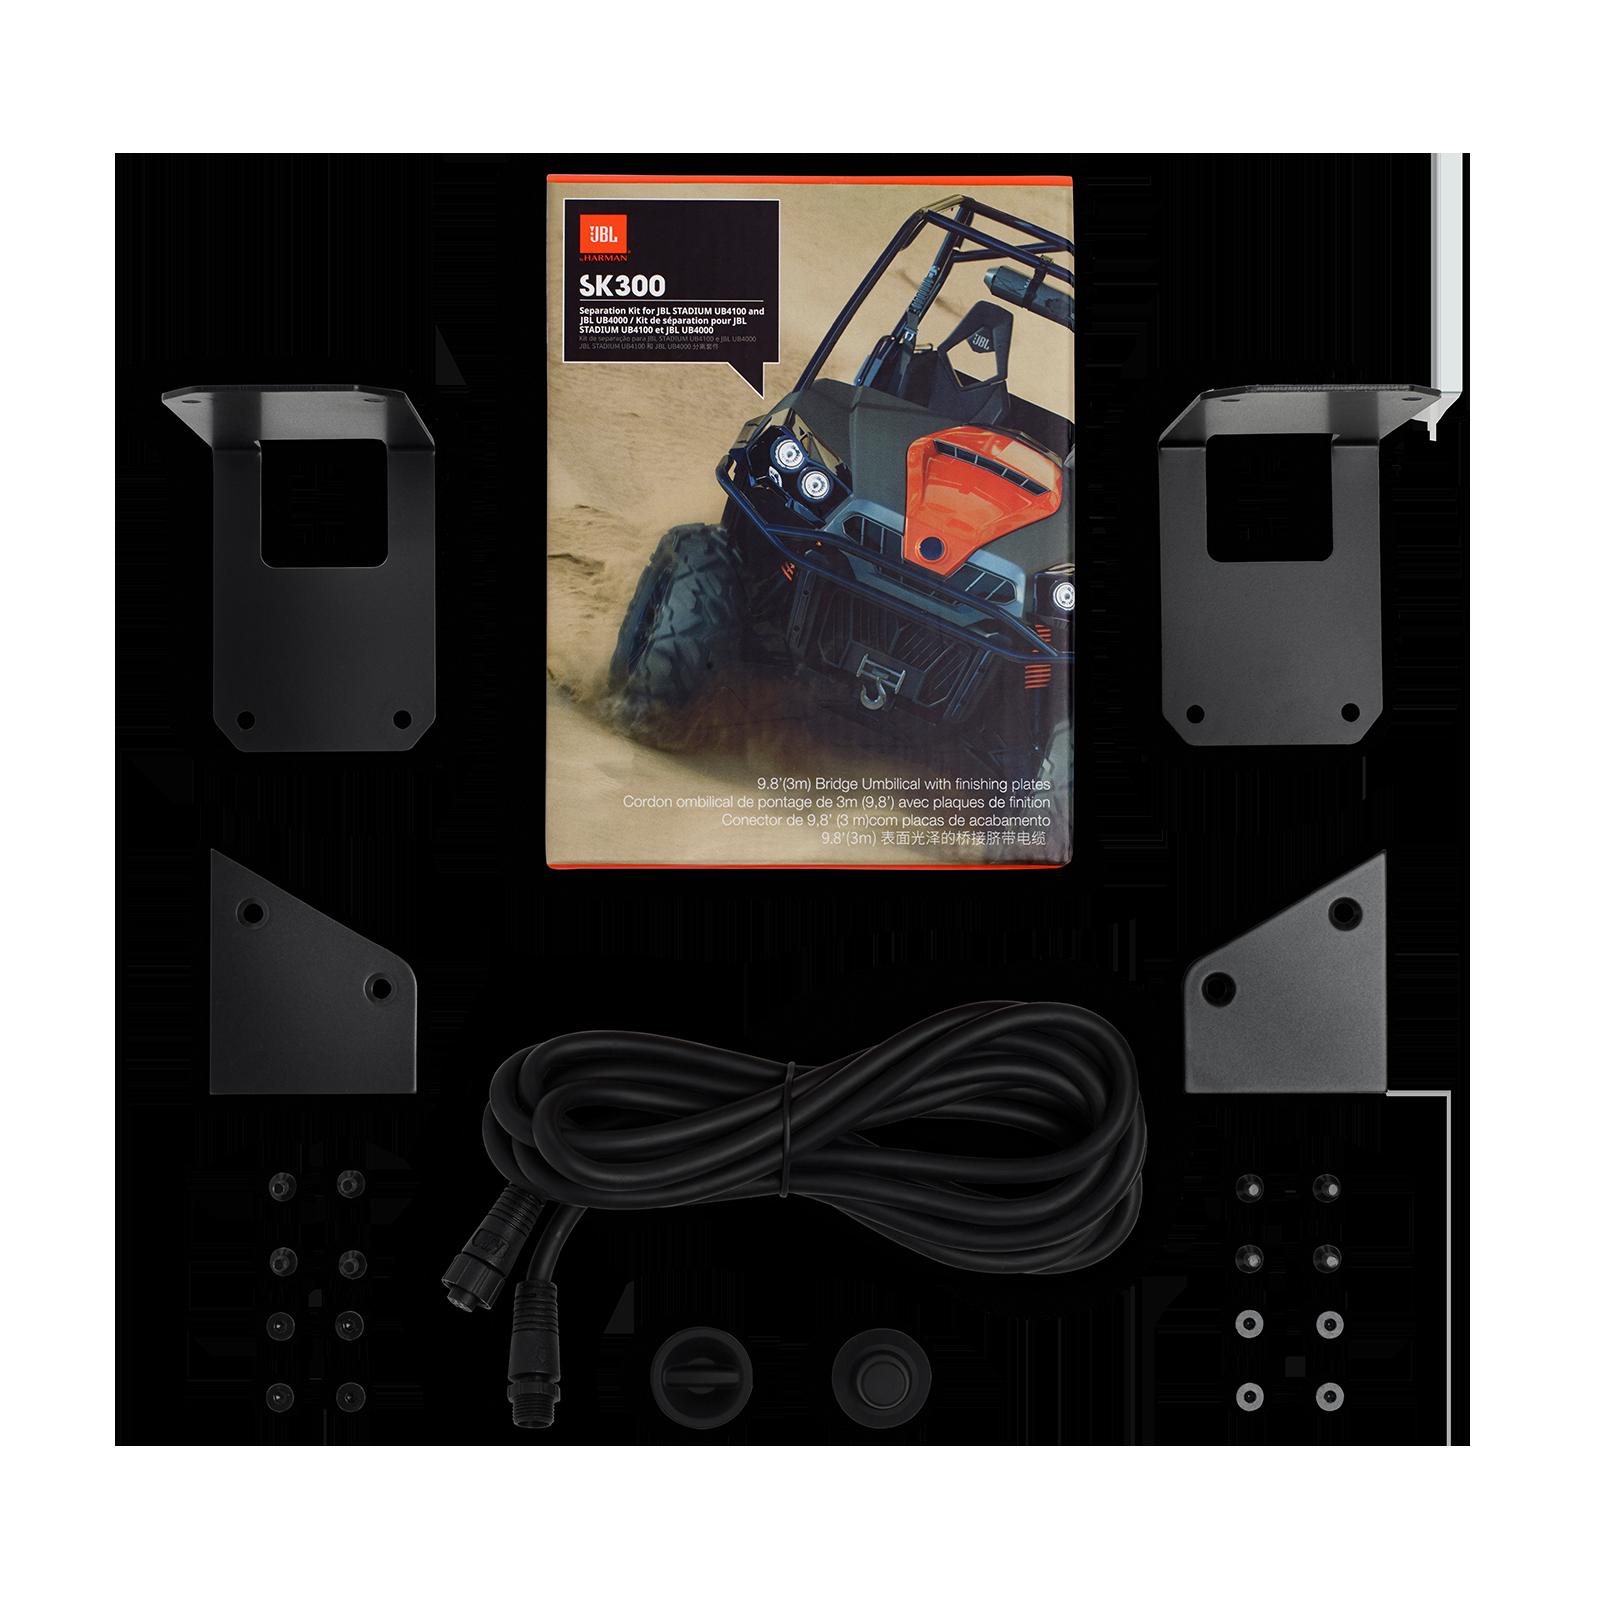 JBL SK300 Separation Kit - Black - 9.8'(3m) Bridge Umbilical with finishing plates - Detailshot 1